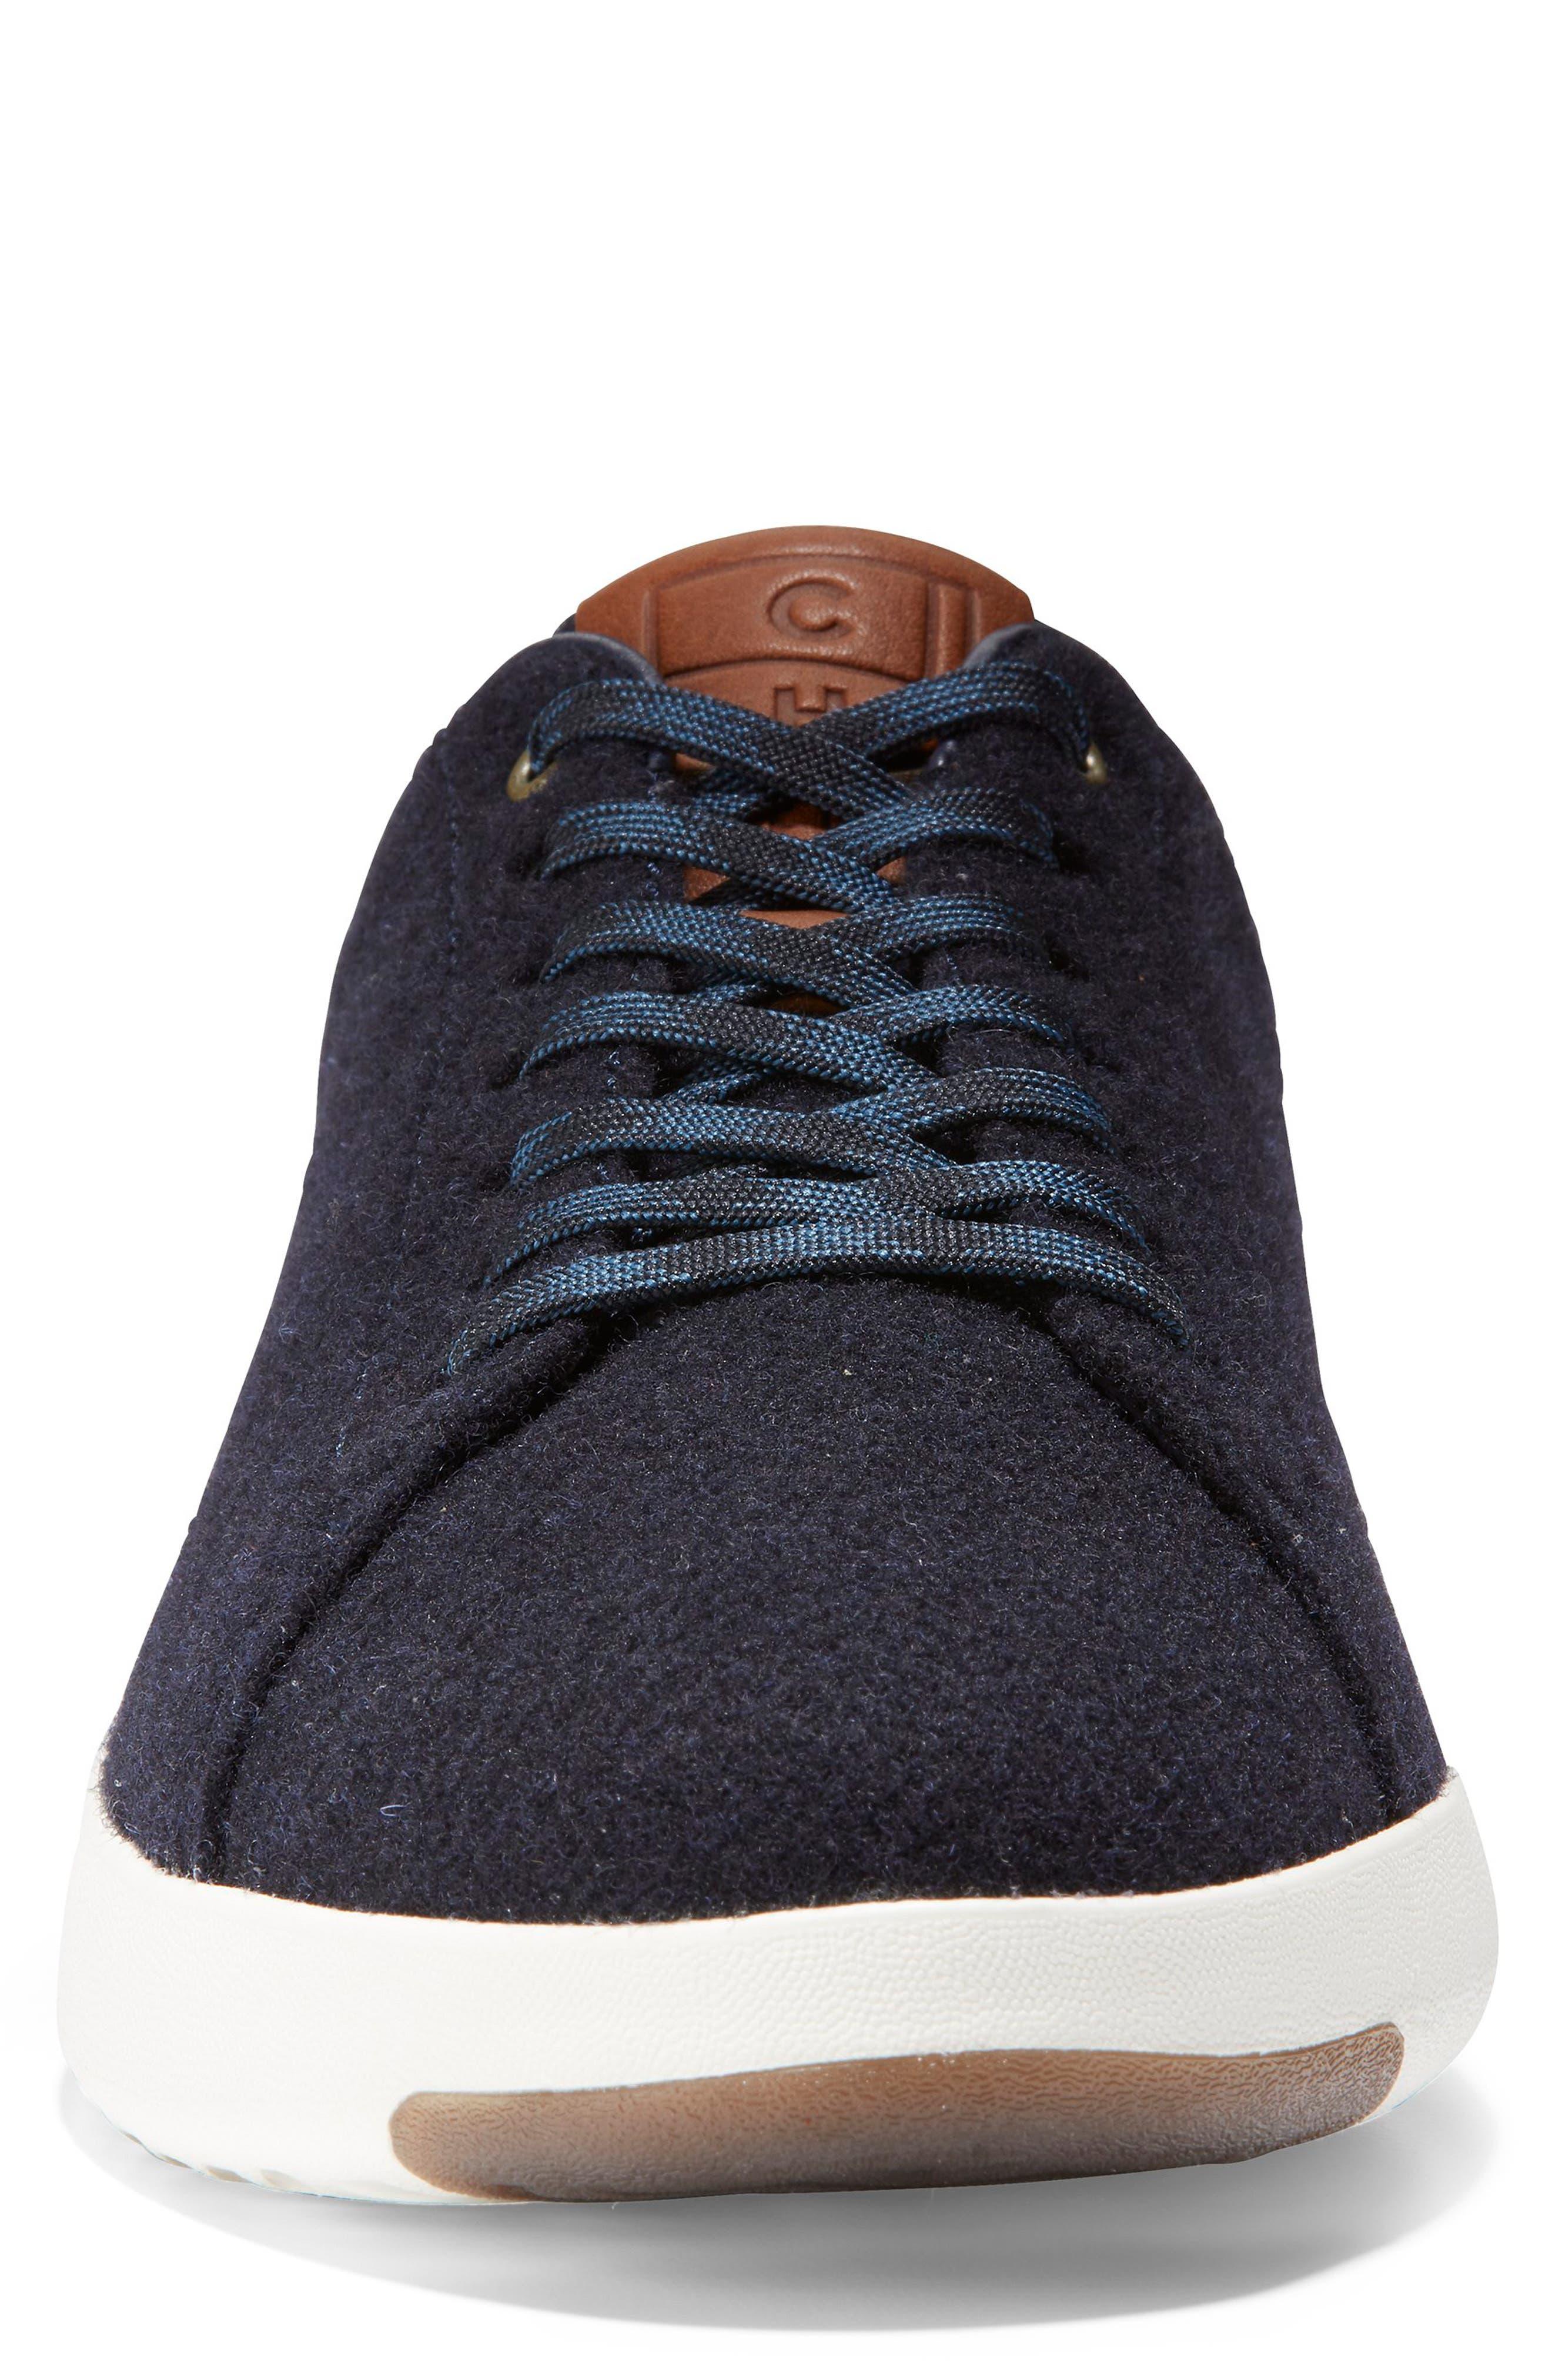 GrandPro Tennis Sneaker,                             Alternate thumbnail 4, color,                             NAVY INK WOOL/ BRITISH TAN